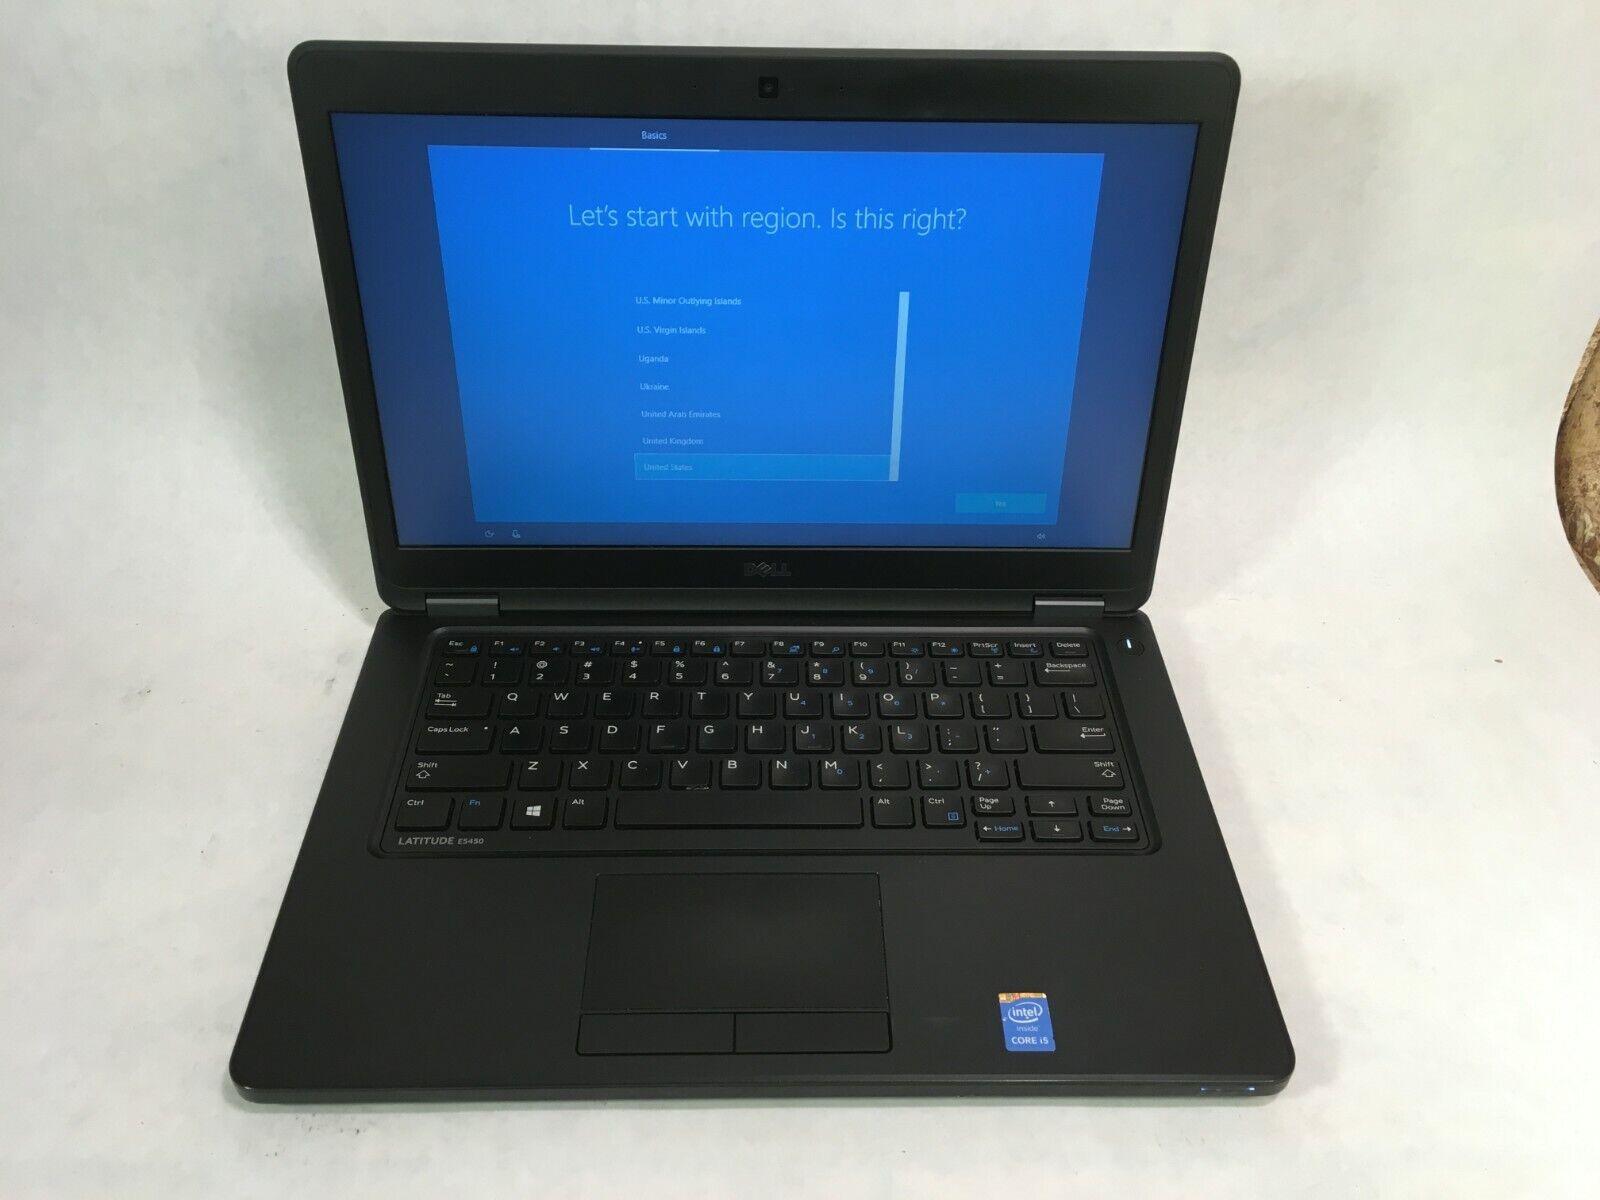 "Laptop Windows - Dell Latitude E5450 14"" Laptop Intel i3 2.1GHz 4GB RAM 250GB HDD Windows 10"